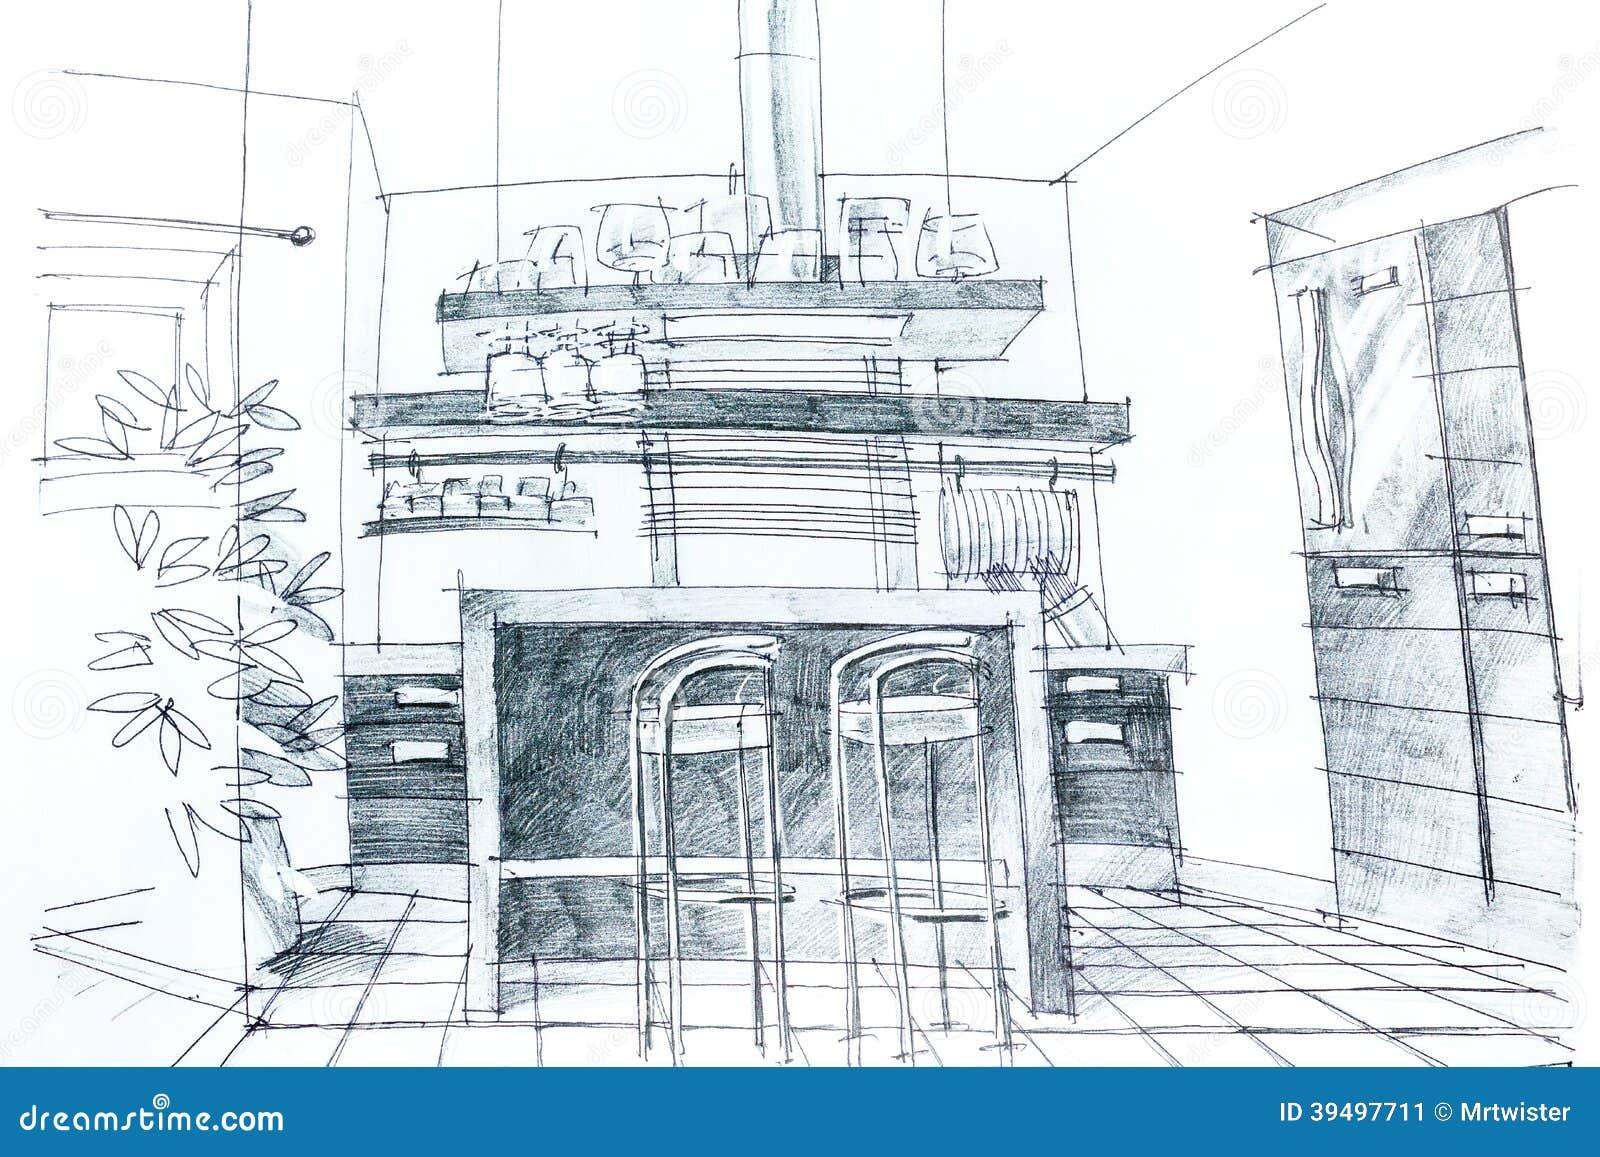 Graphic sketch of kitchen stock illustration. Illustration of ...